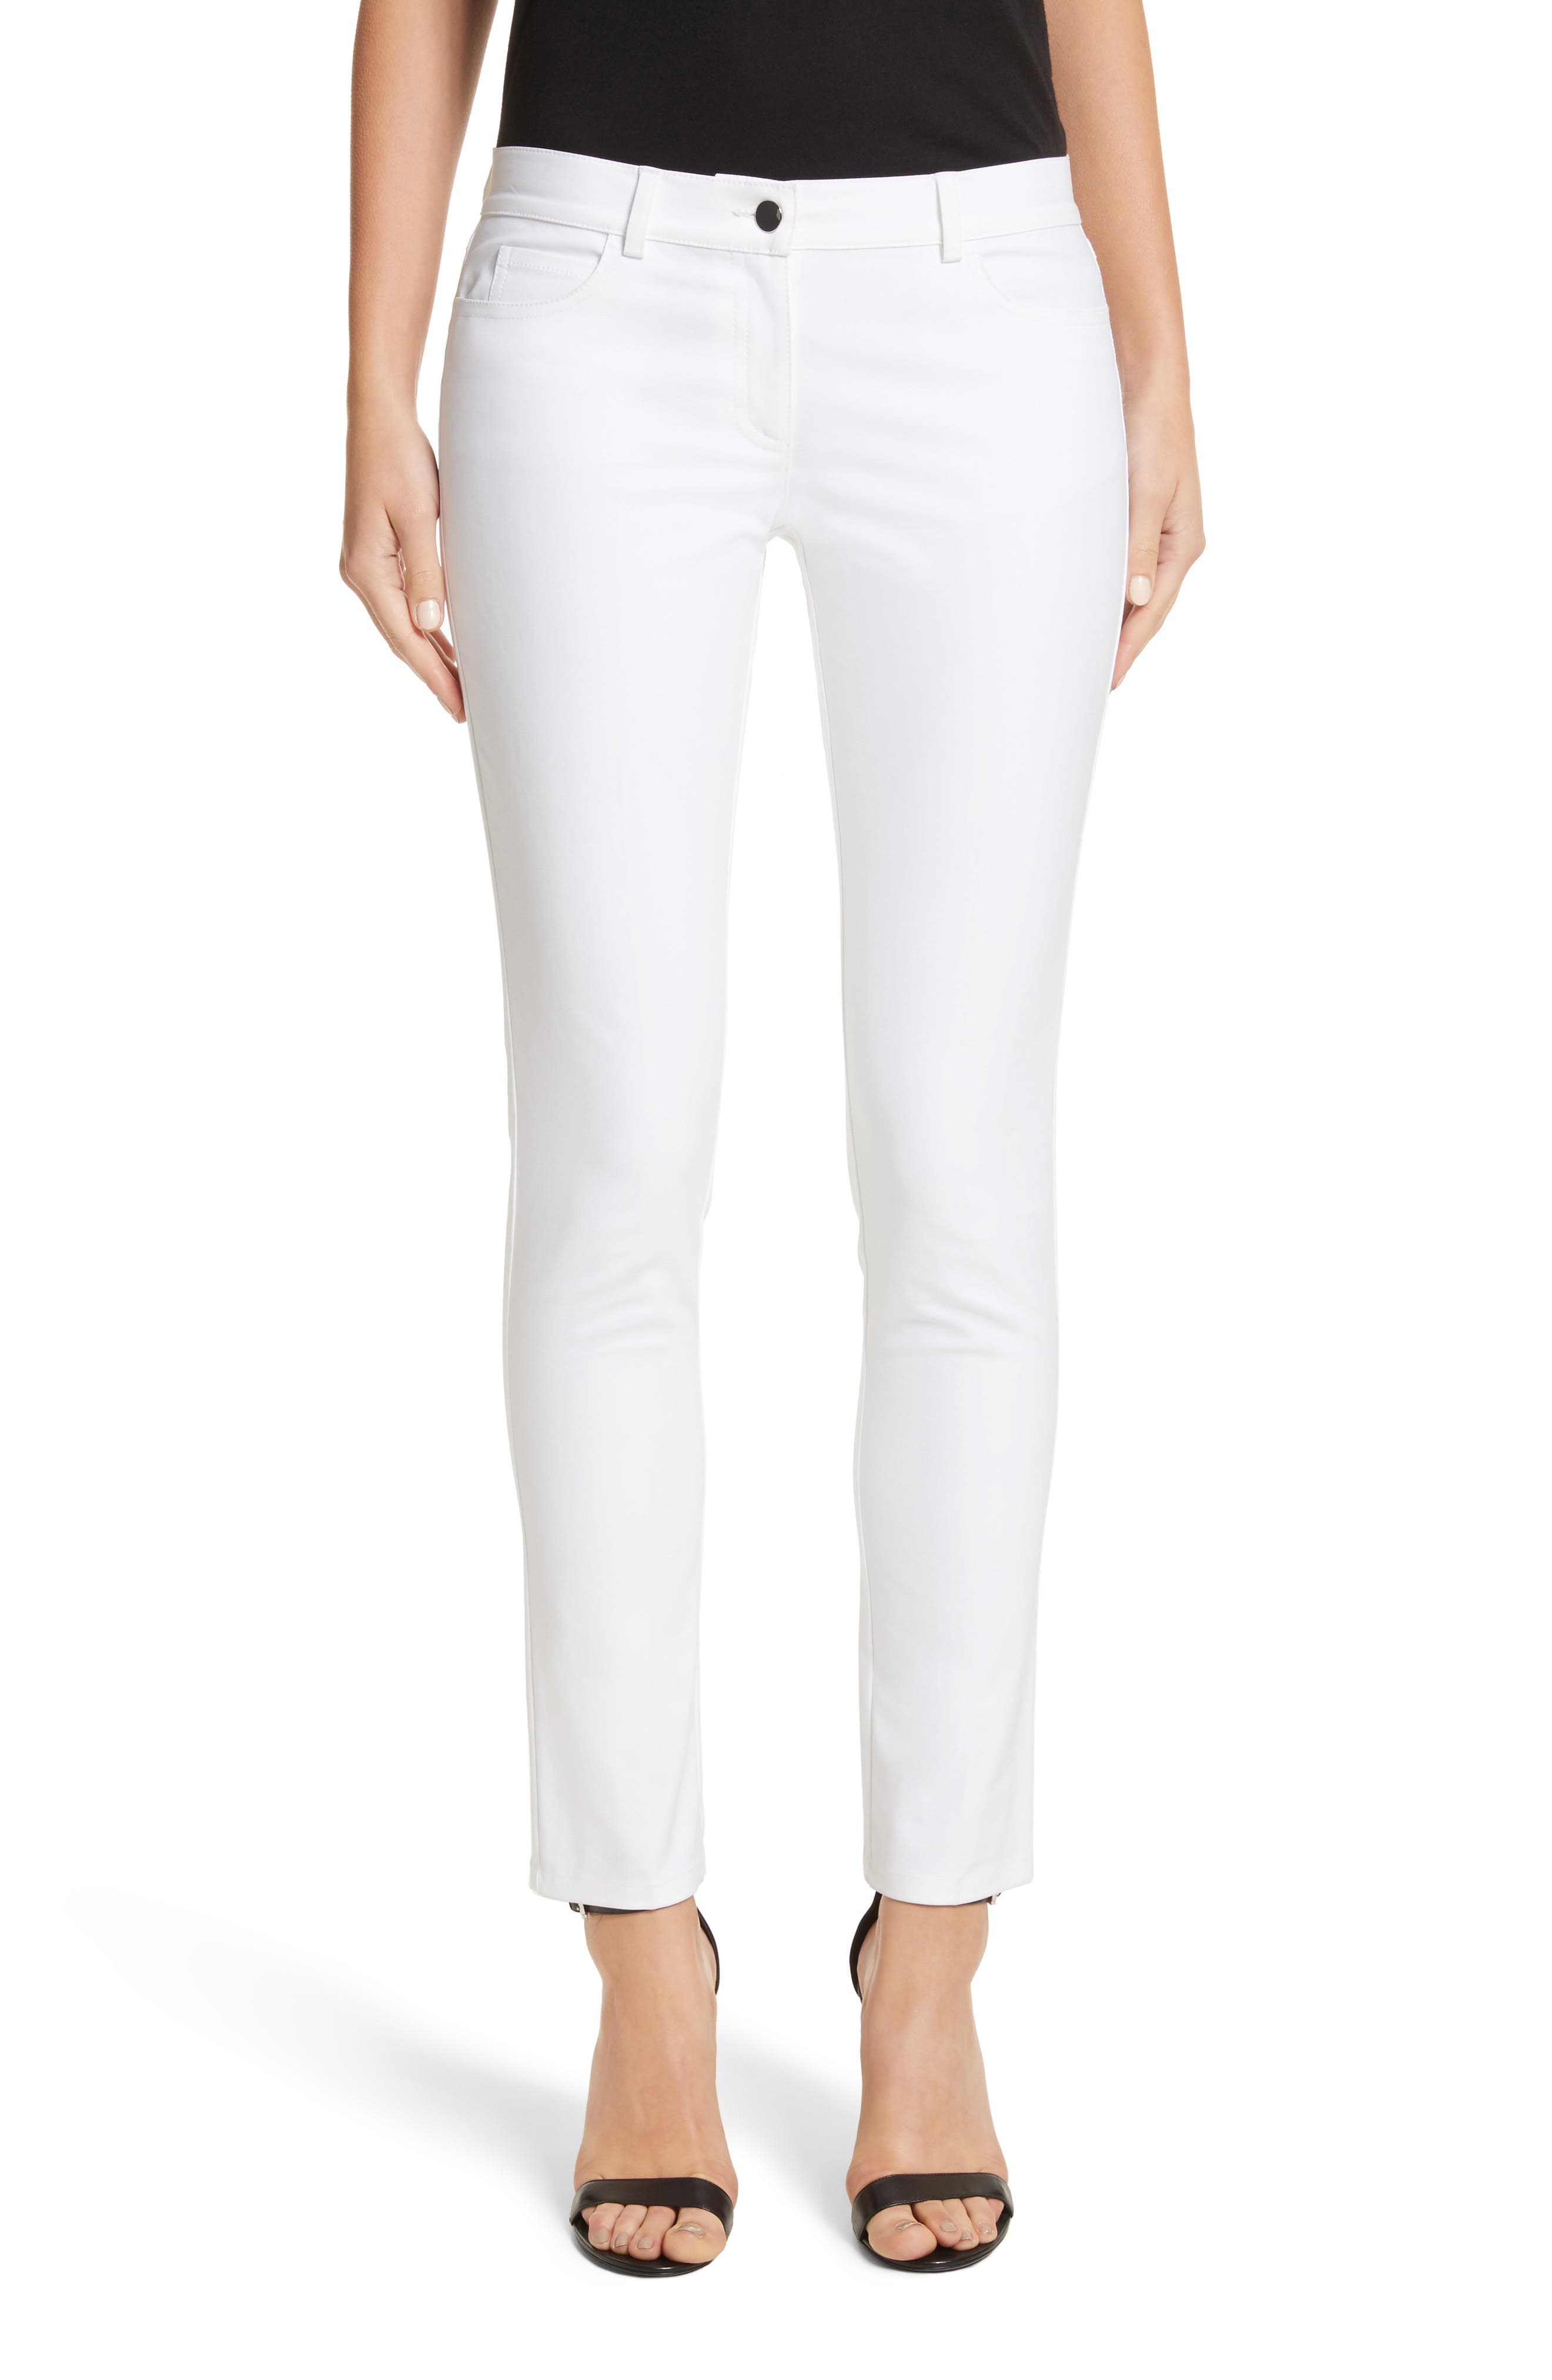 Alternate Image 1 Selected - Michael Kors Samantha Skinny Jeans (Optic White)